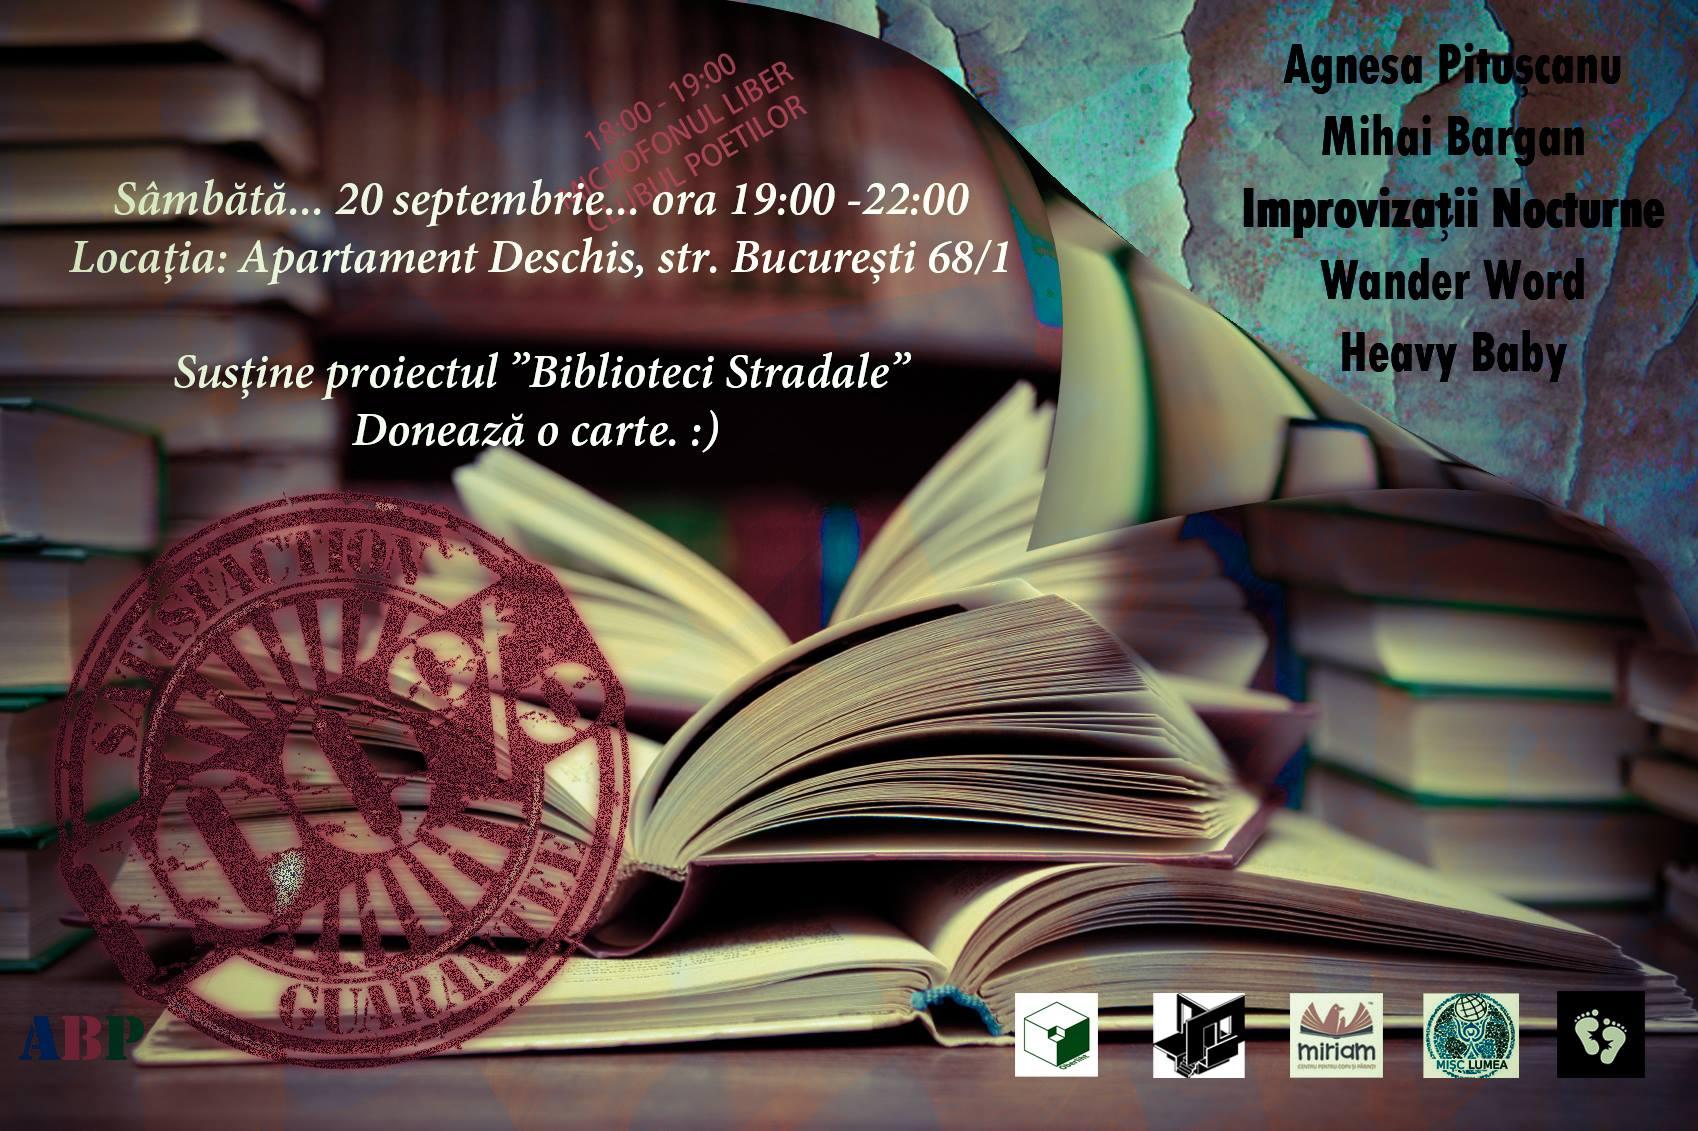 biblioateca_stradala_web